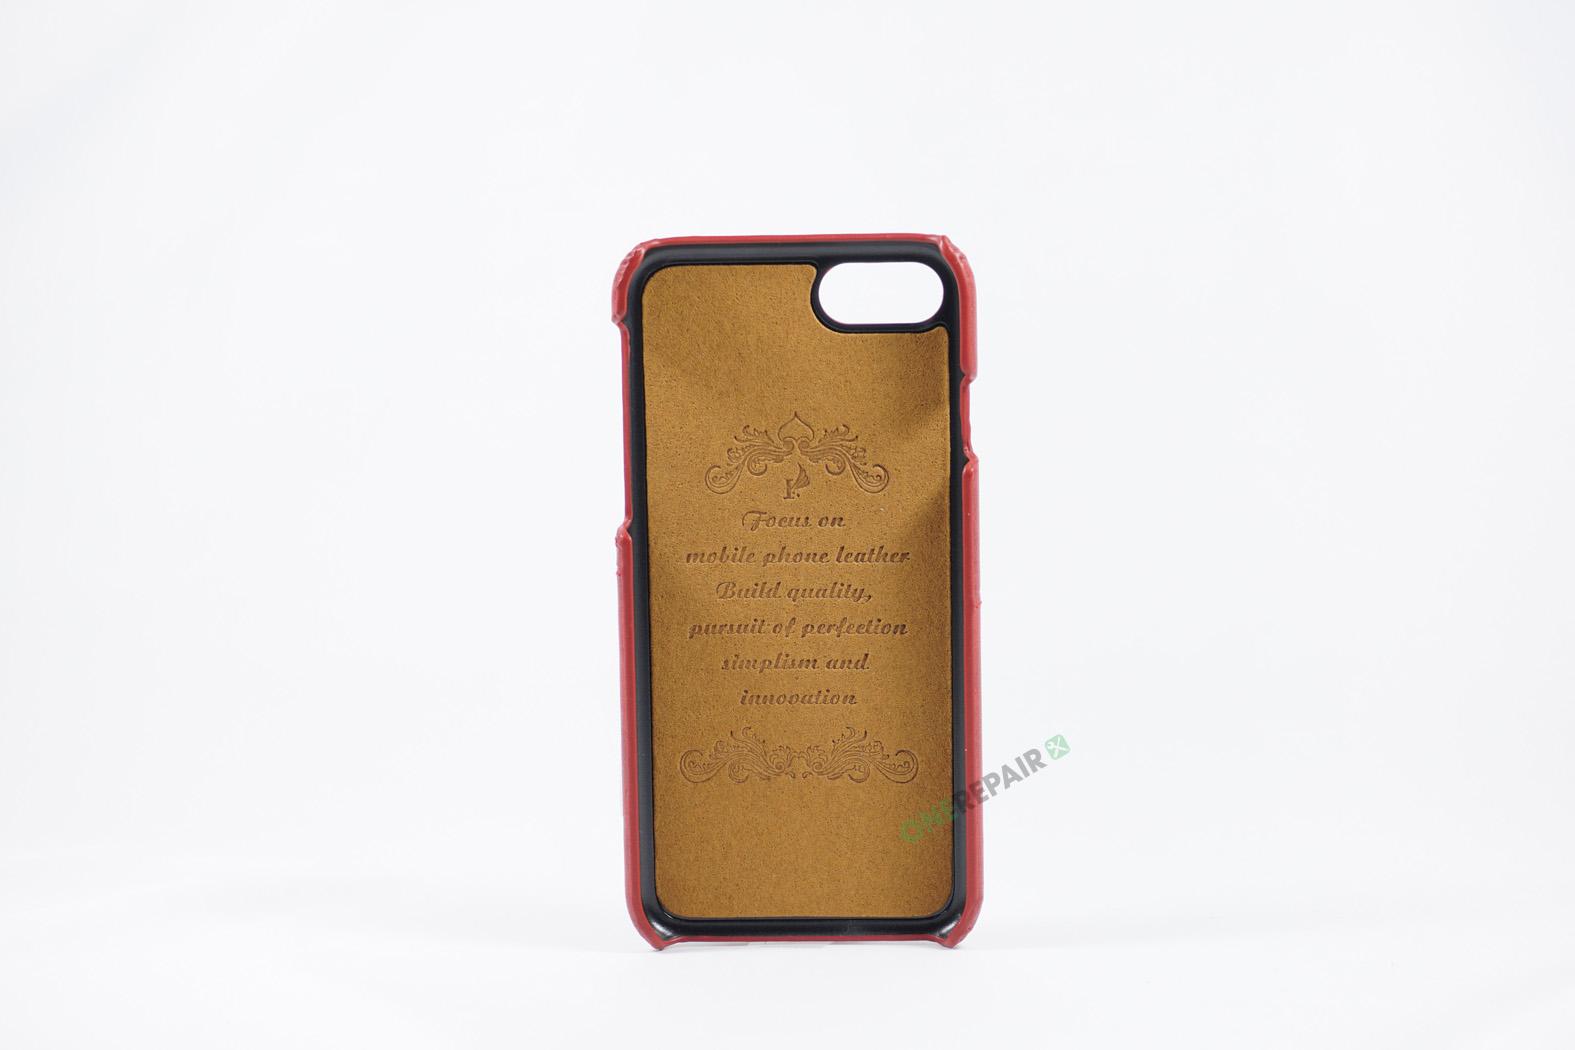 350737_iPhone_7_8_Laeder_Kortholder_Cover_Roed_OneRepair_WM_00003